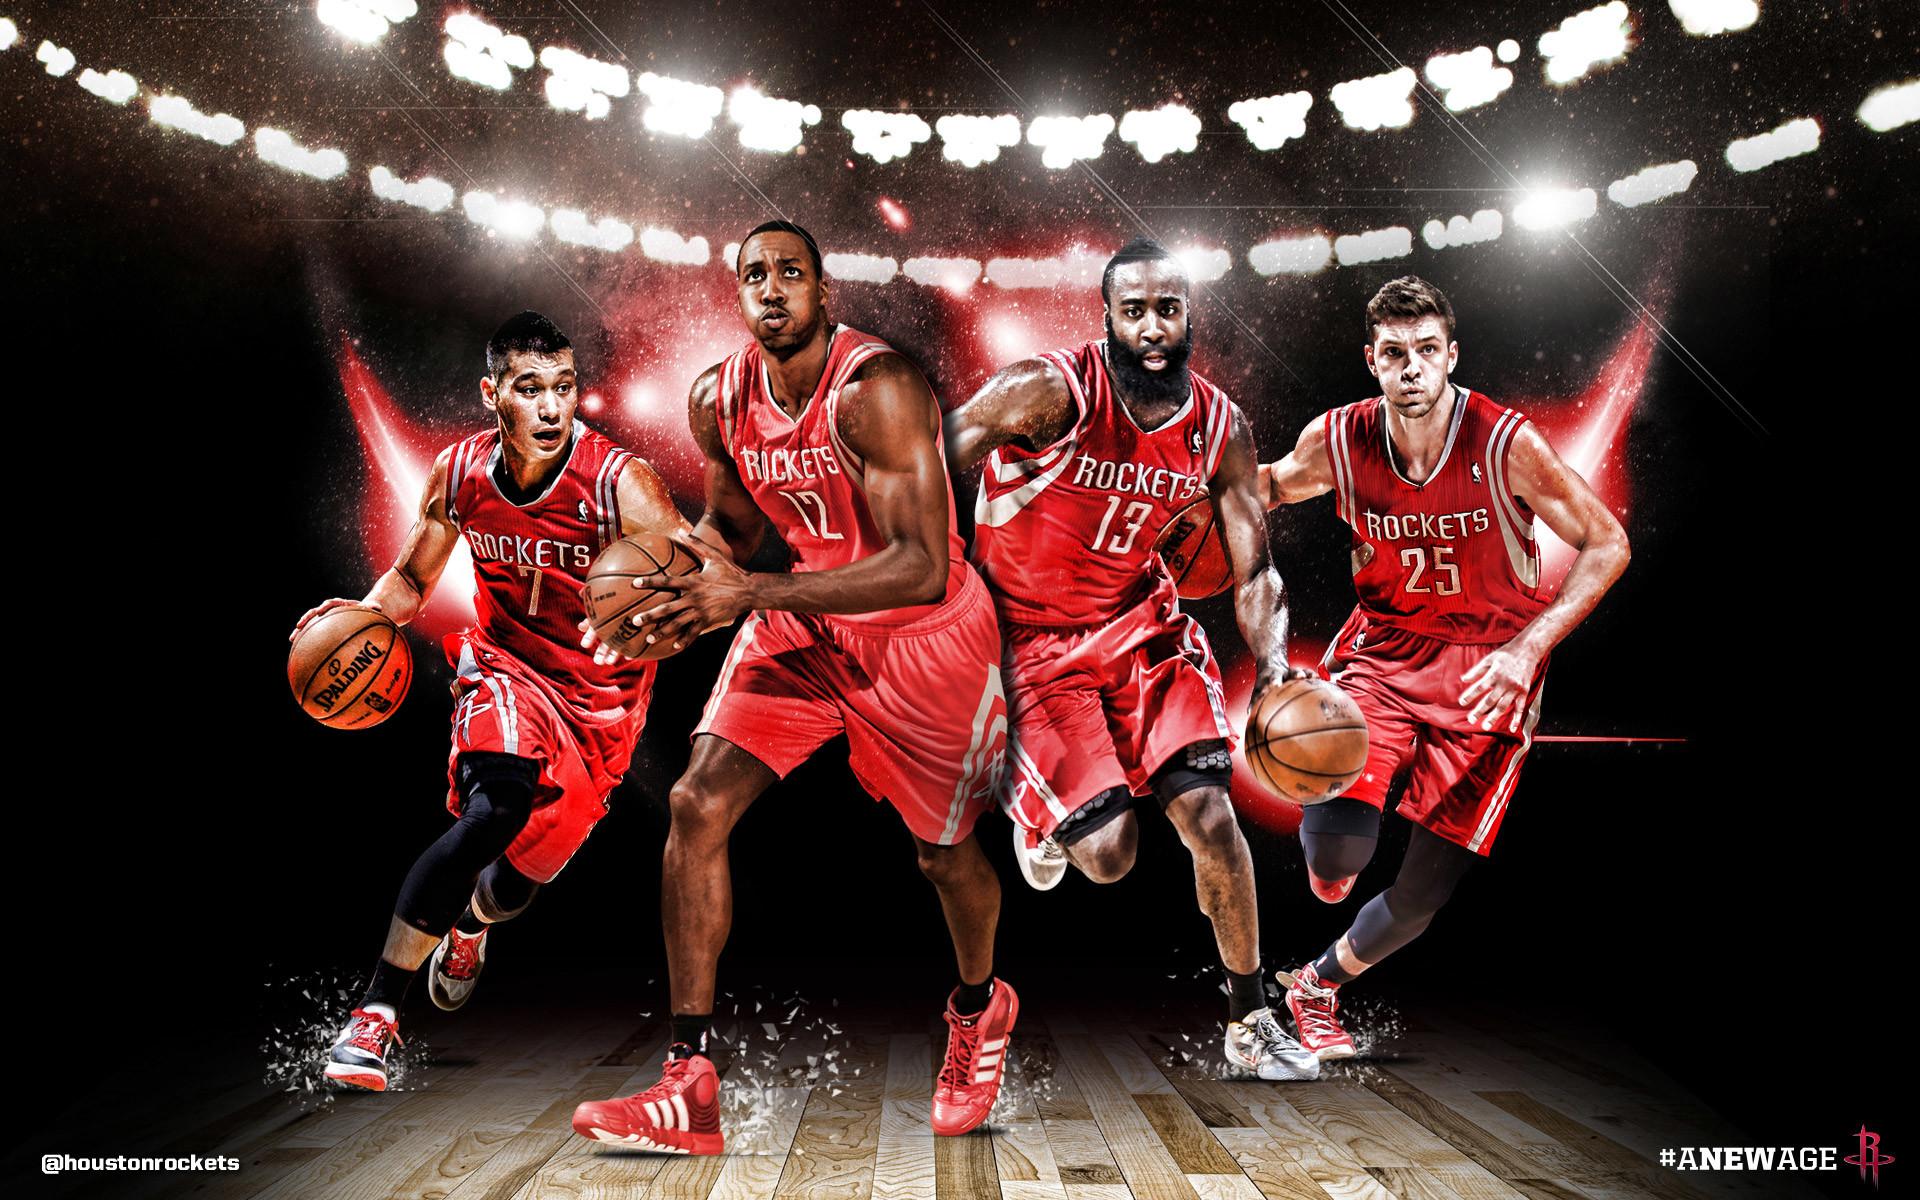 Houston Rockets Big 4 2013 Wallpaper